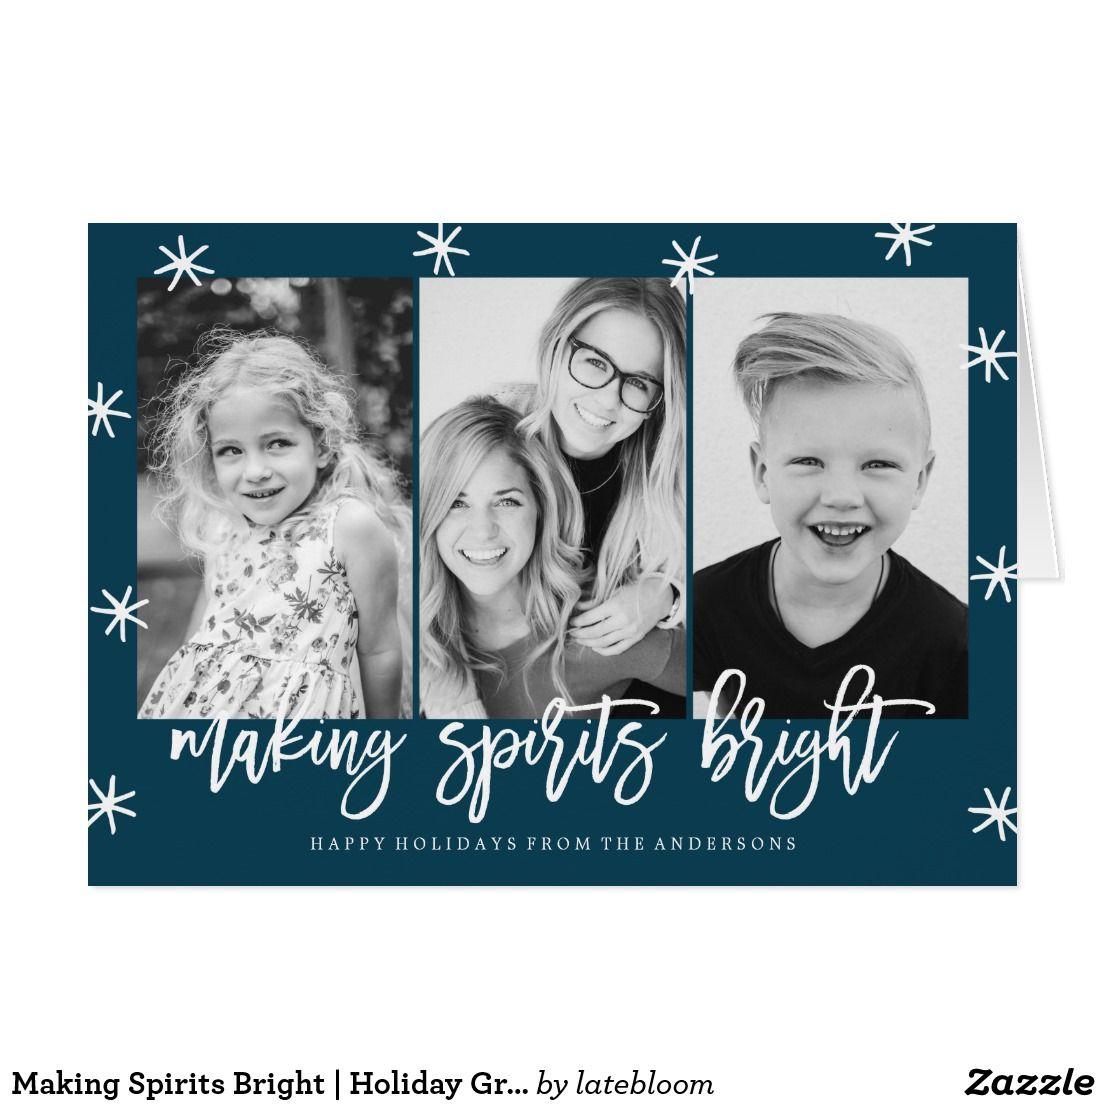 Making Spirits Bright Holiday Greeting Card Celebrate The Holiday